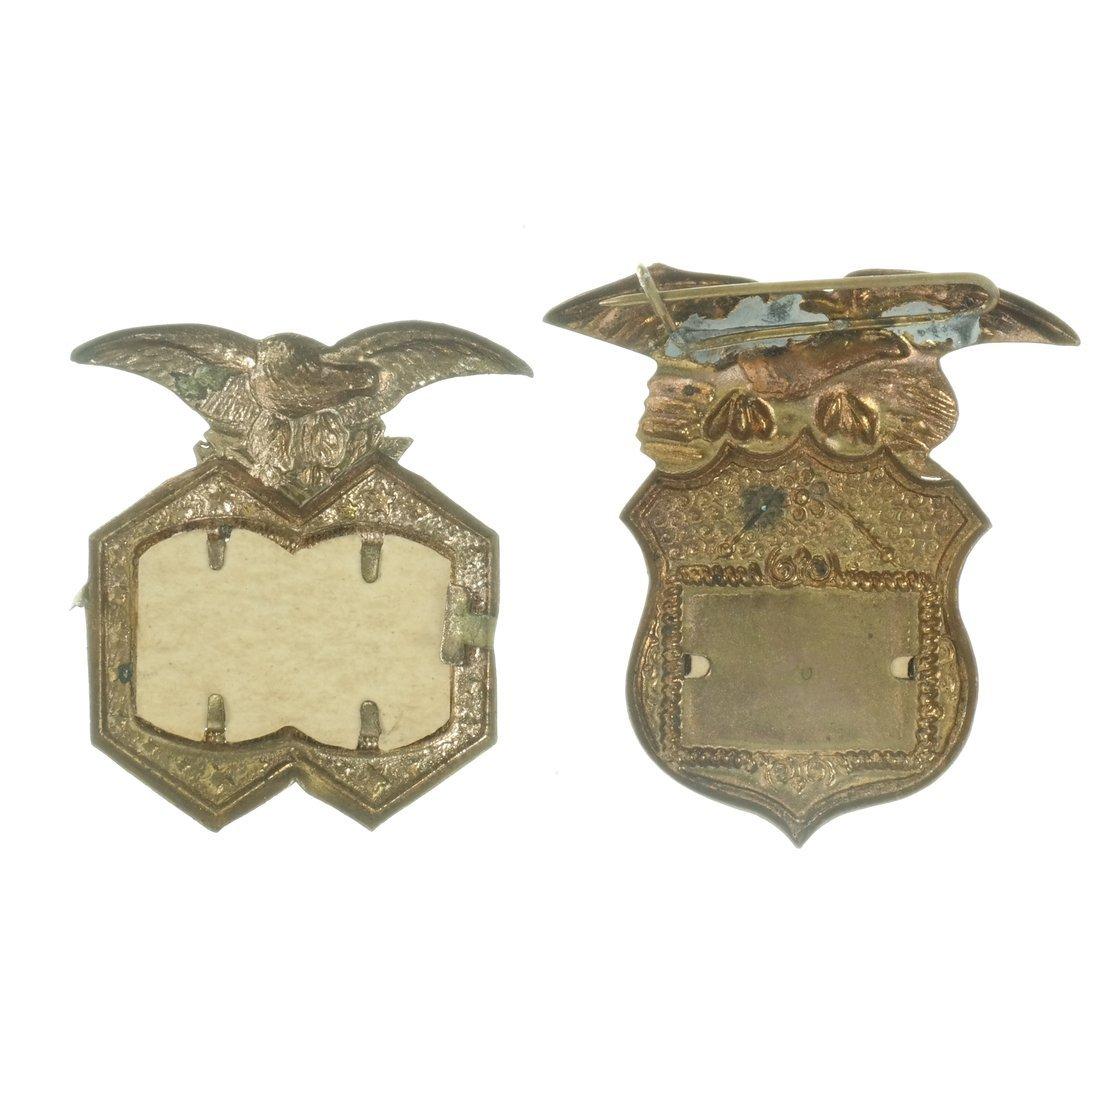 Blaine & Logan Two 1884 Jugate Shell Badges - 2